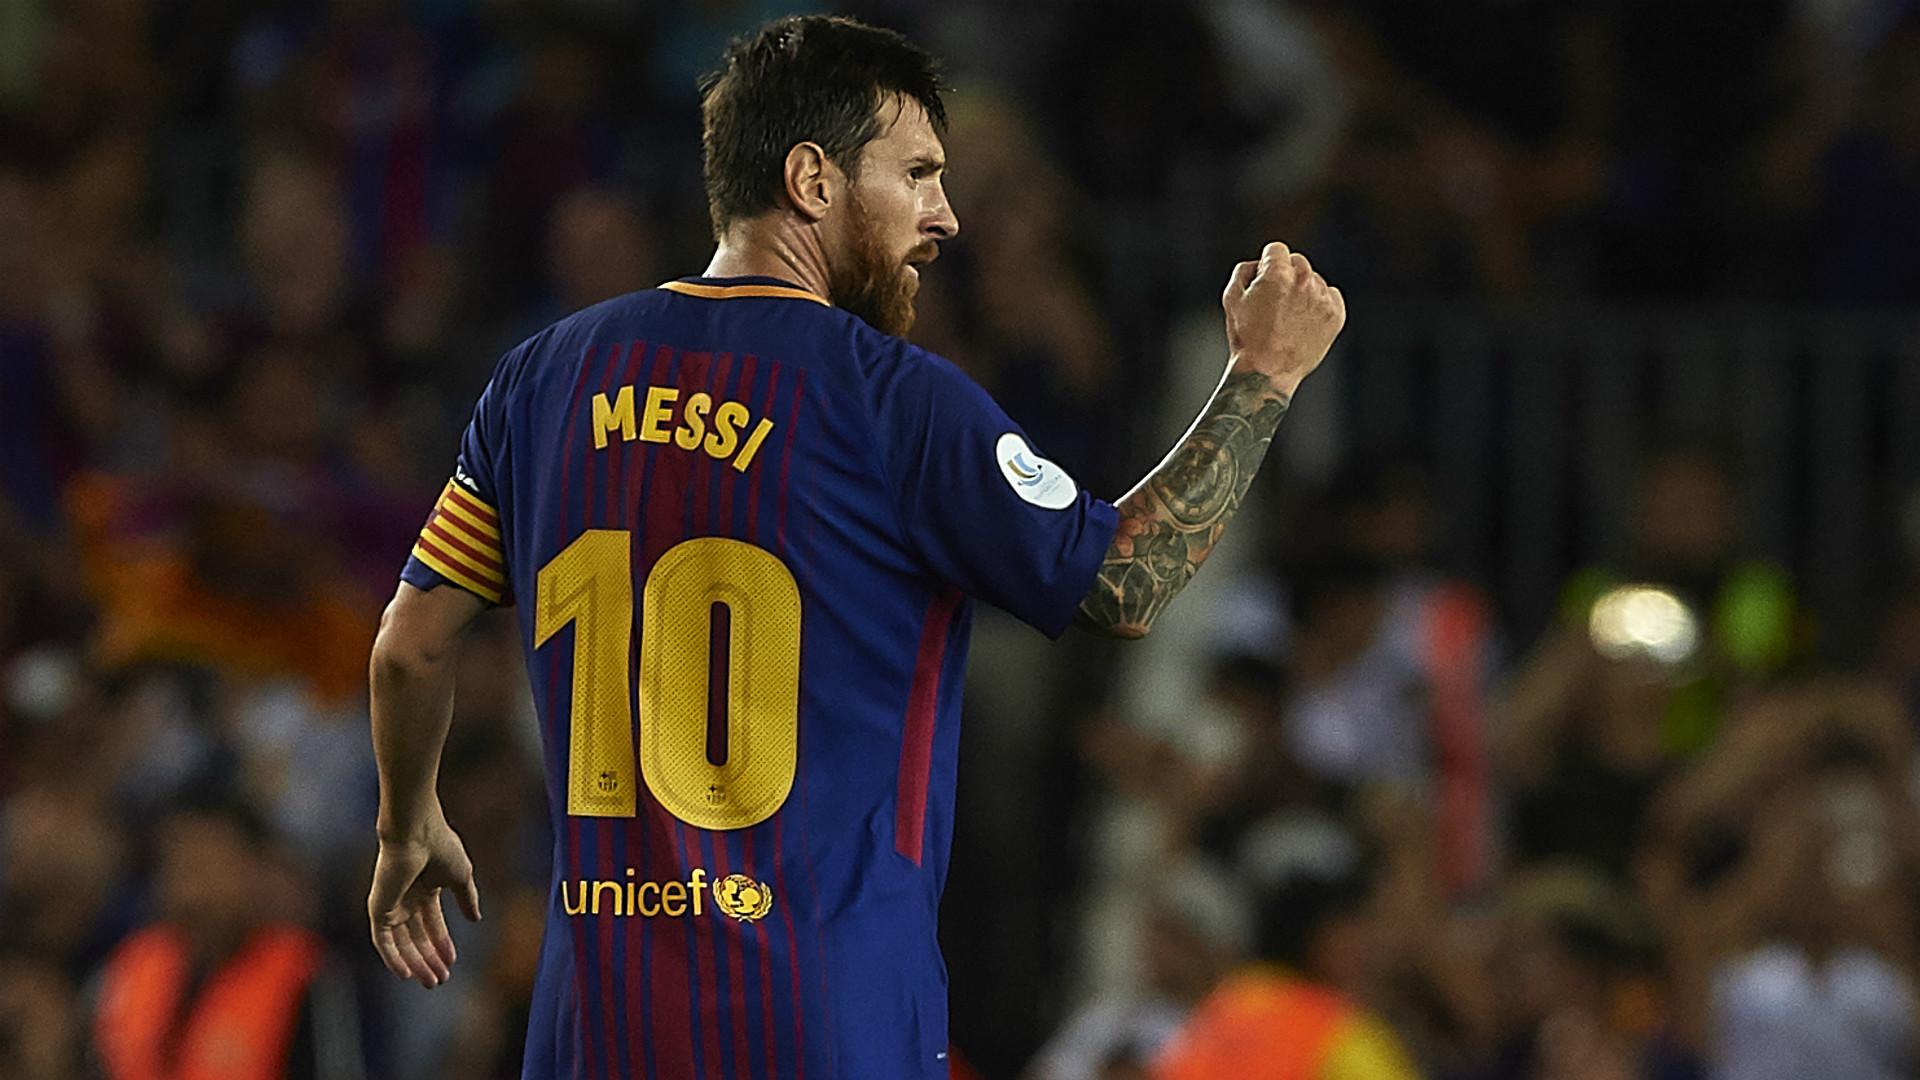 Download - Leo Messi 2017 18 , HD Wallpaper & Backgrounds